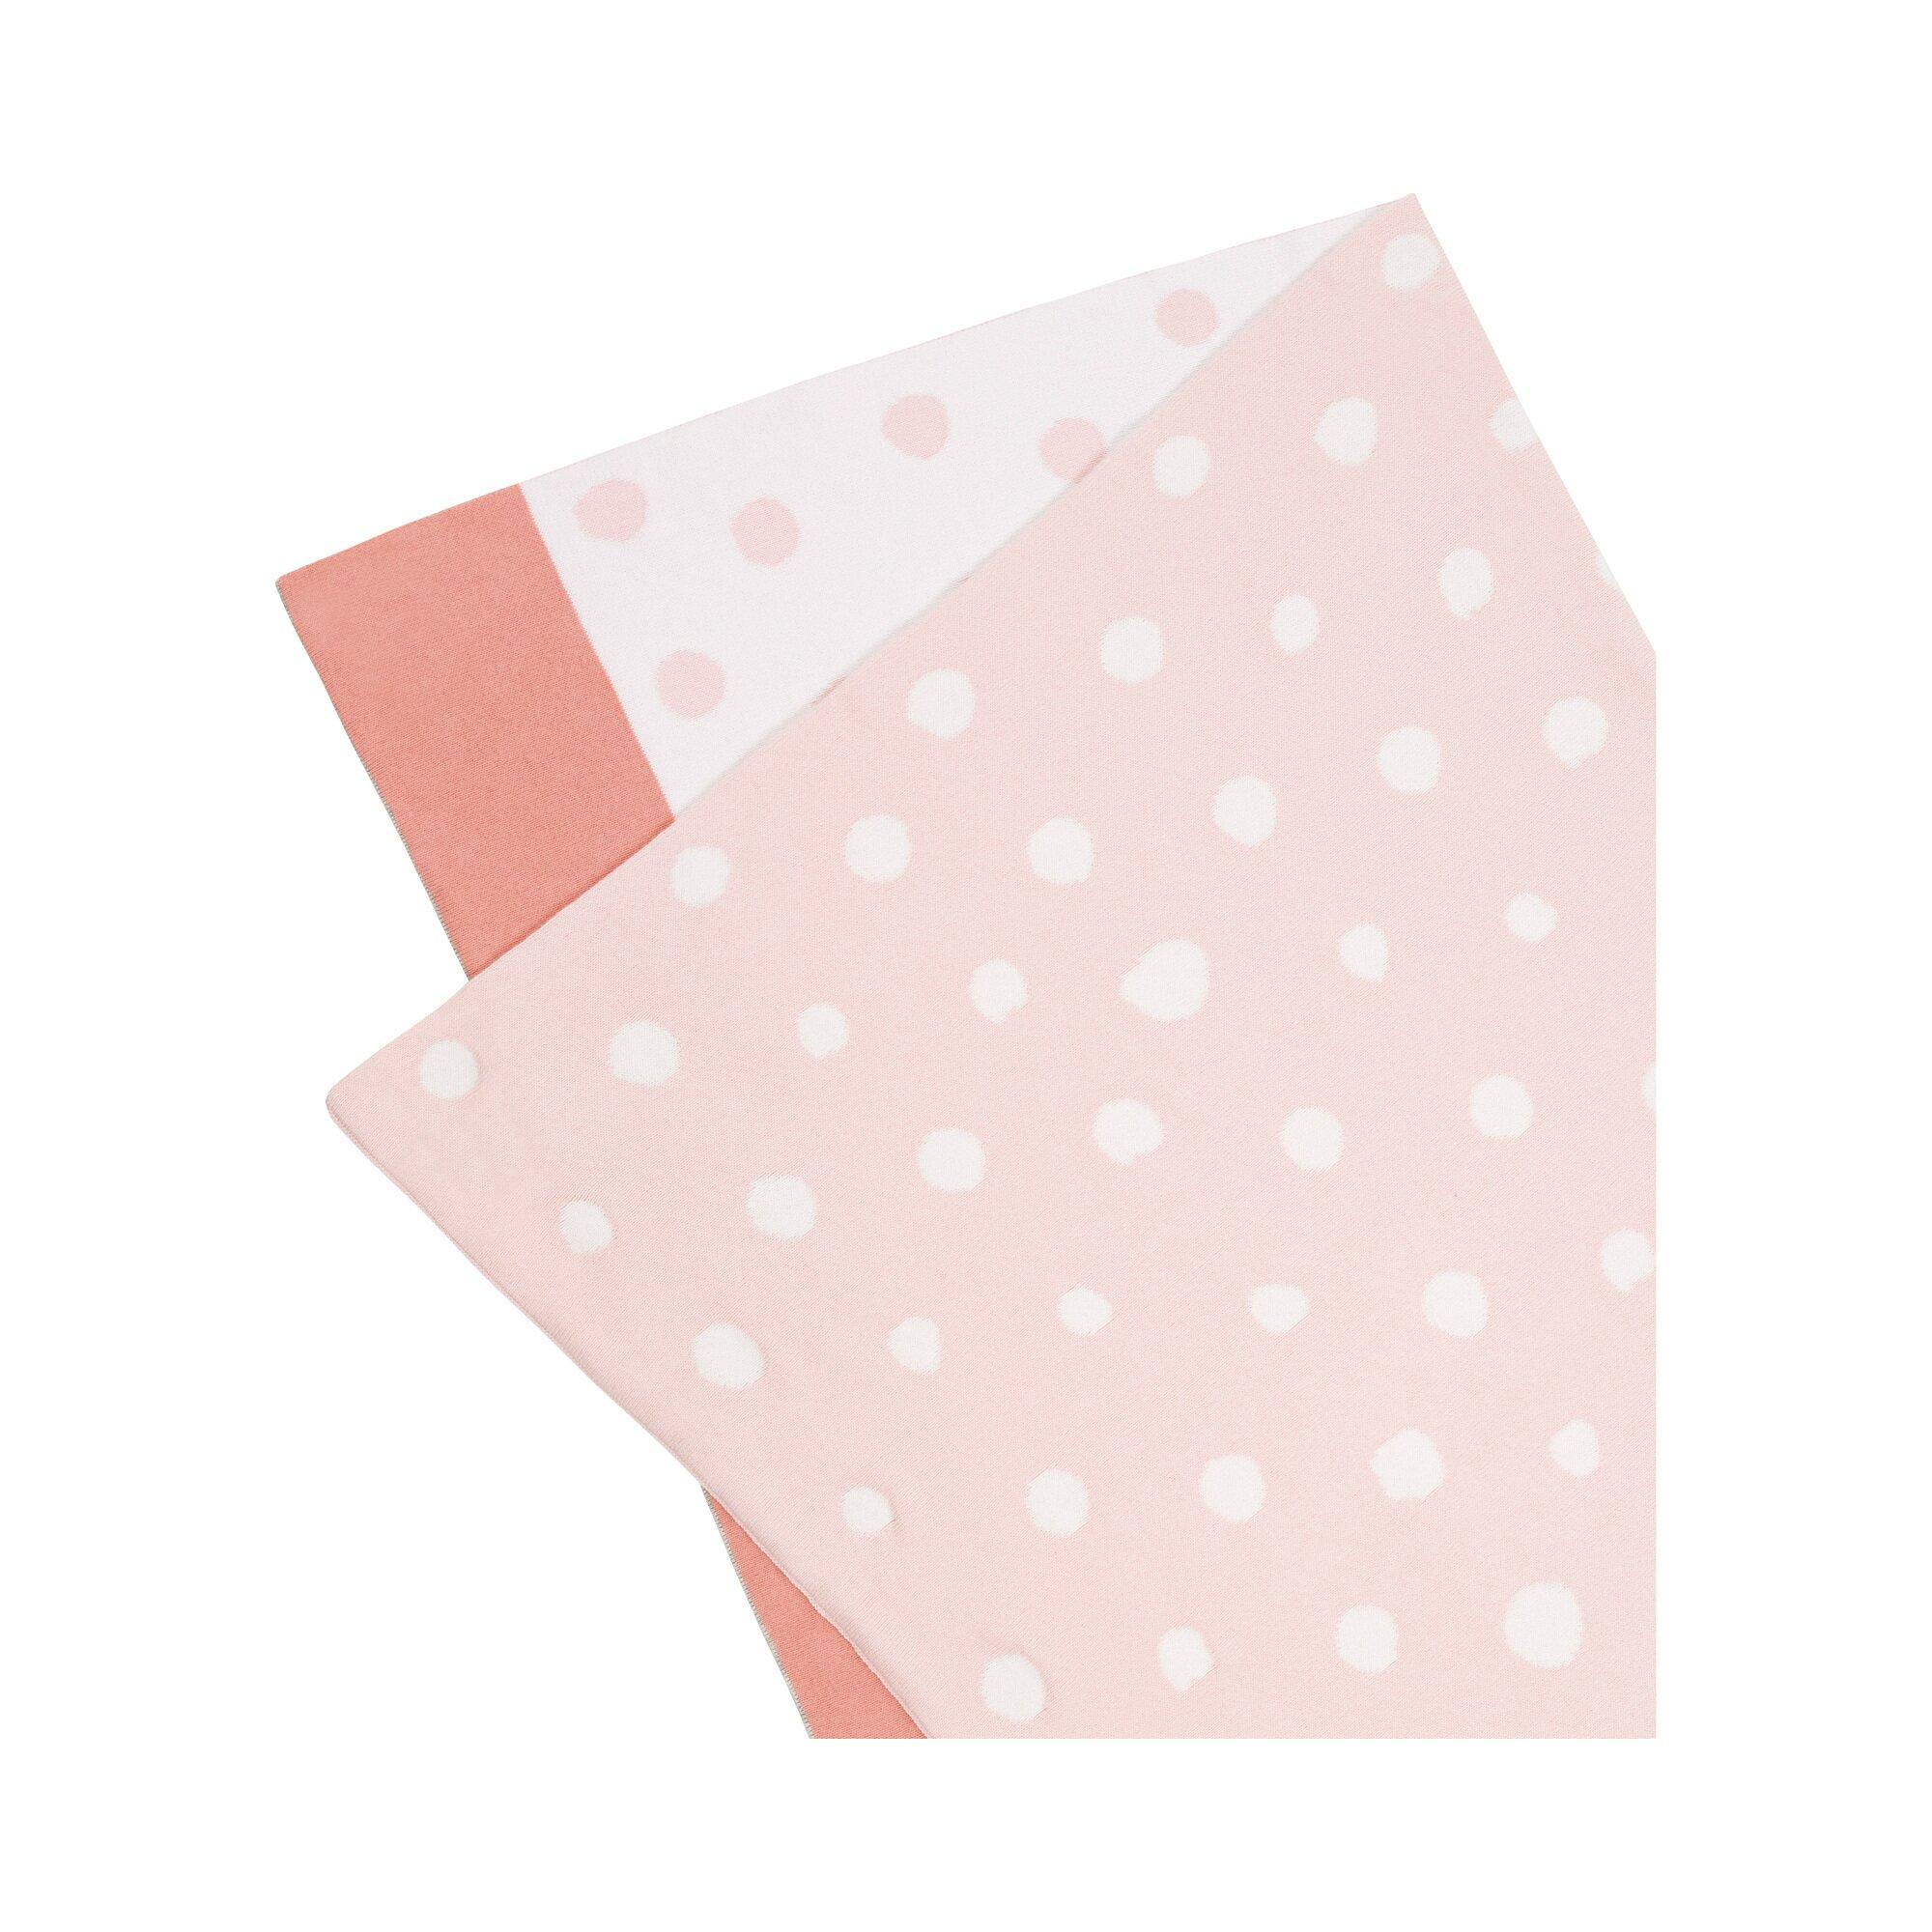 lassig-babydecke-lela-75x100-cm-rosa